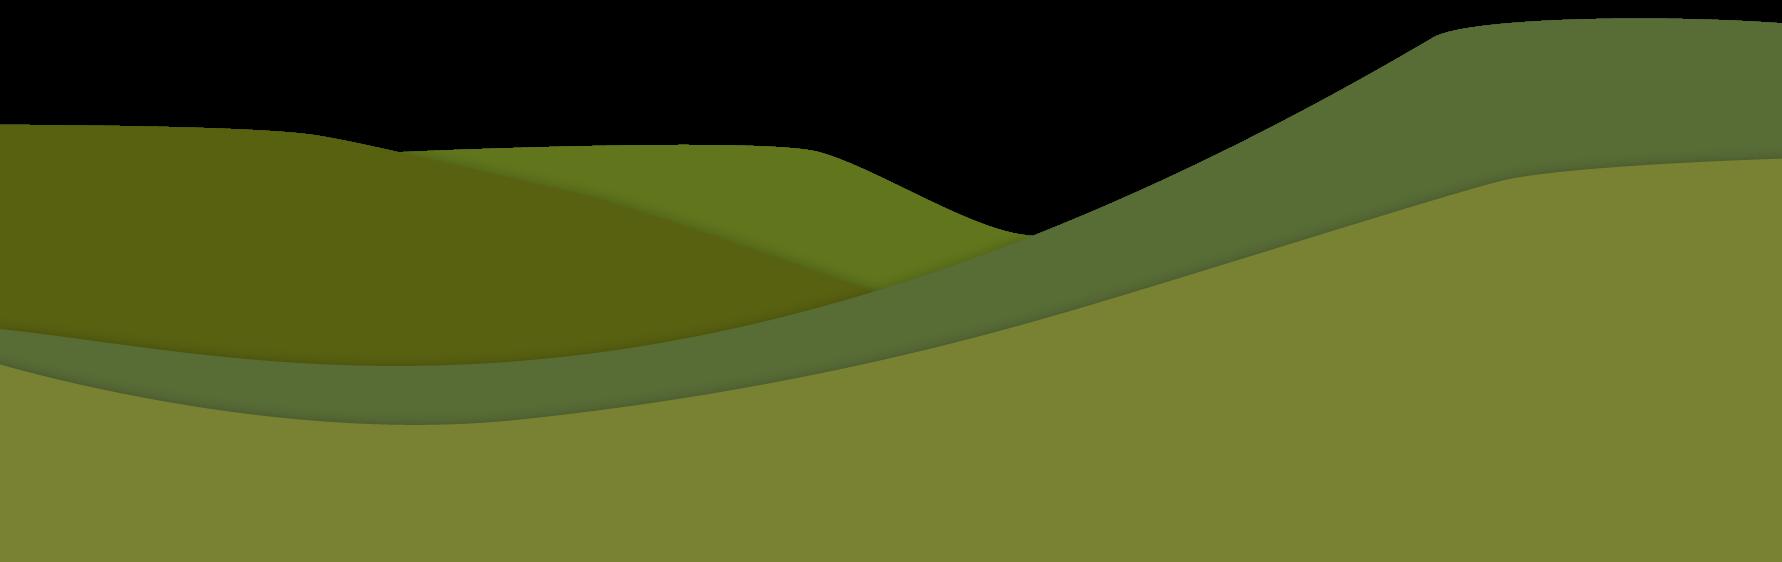 flint hills background